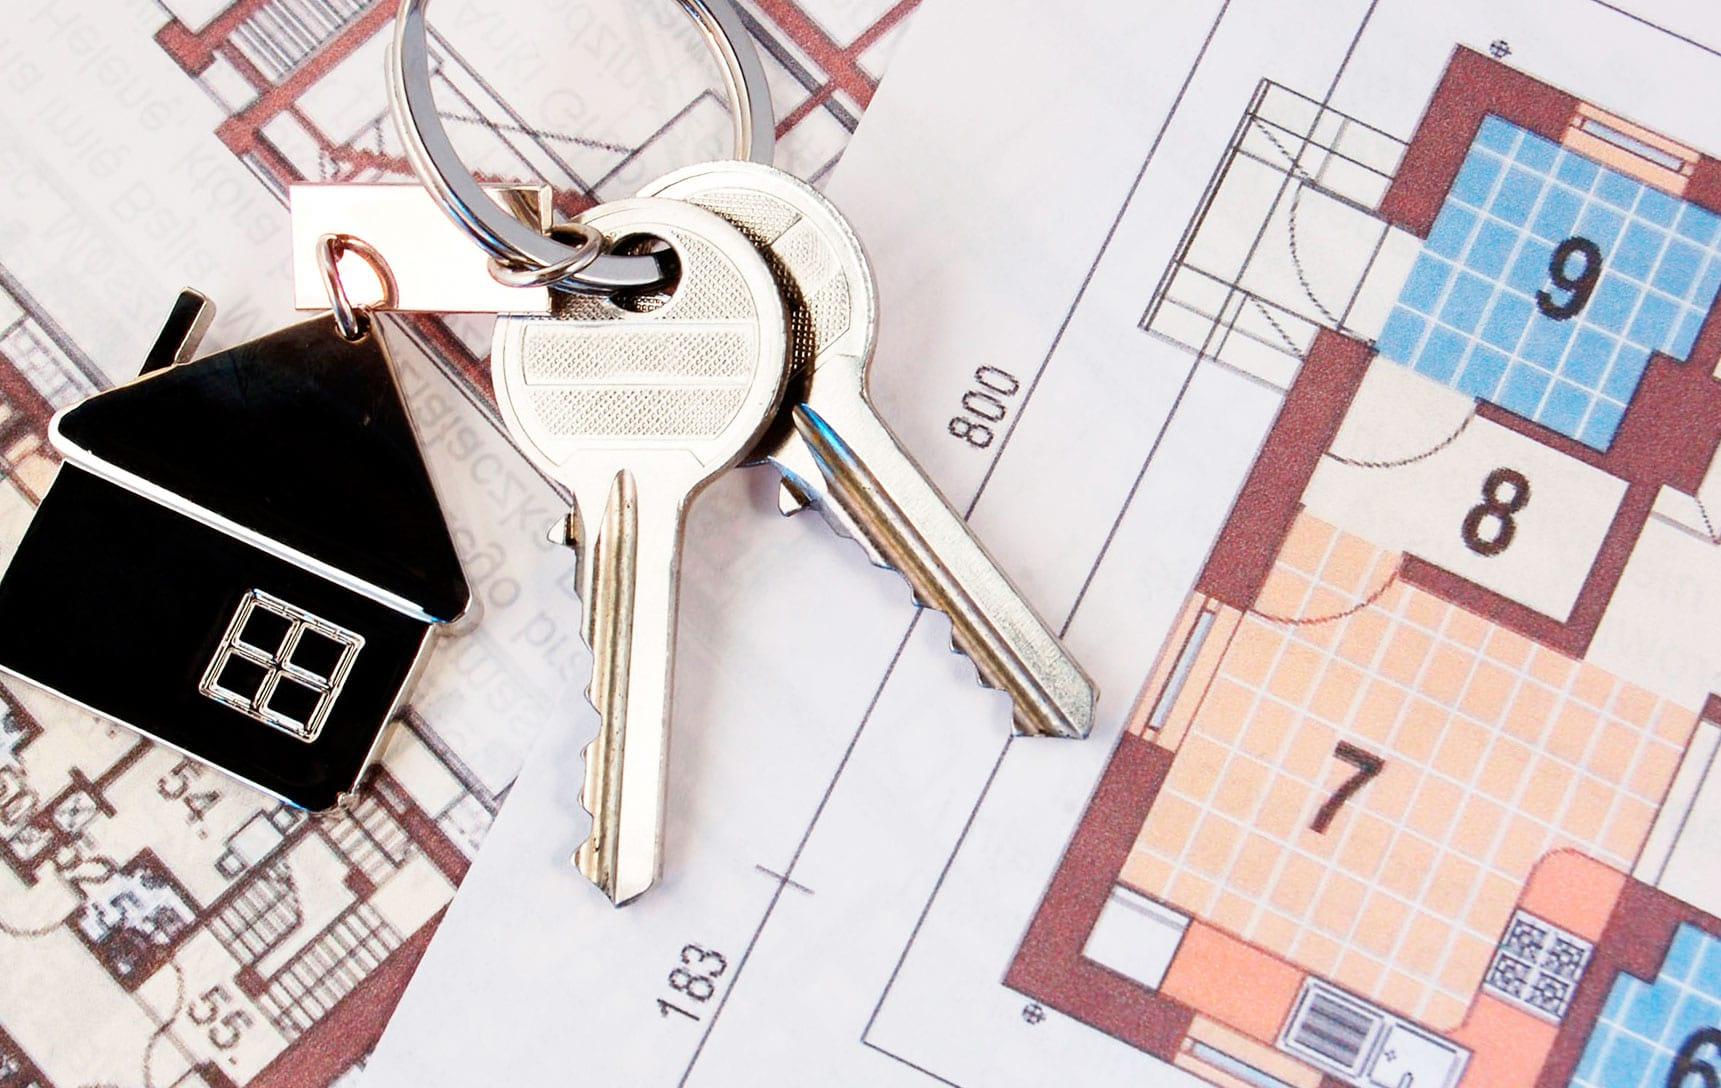 Раздел квартиры при и после развода между супругами